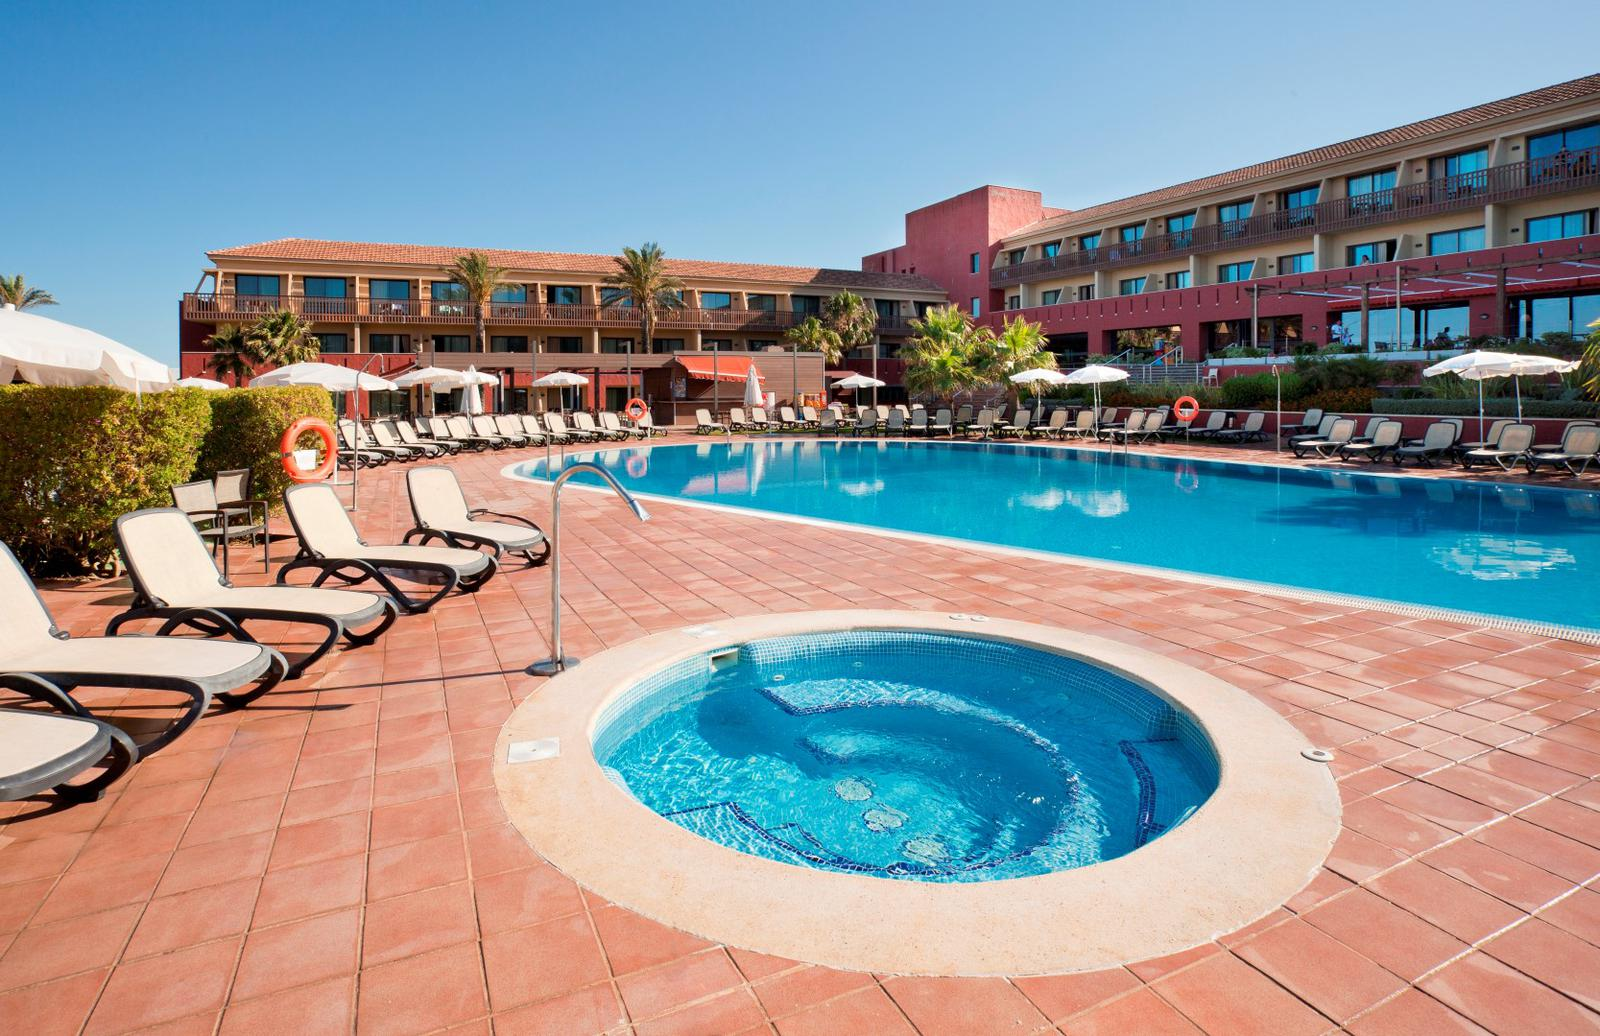 hoteles de playa septiembre4 (Large)